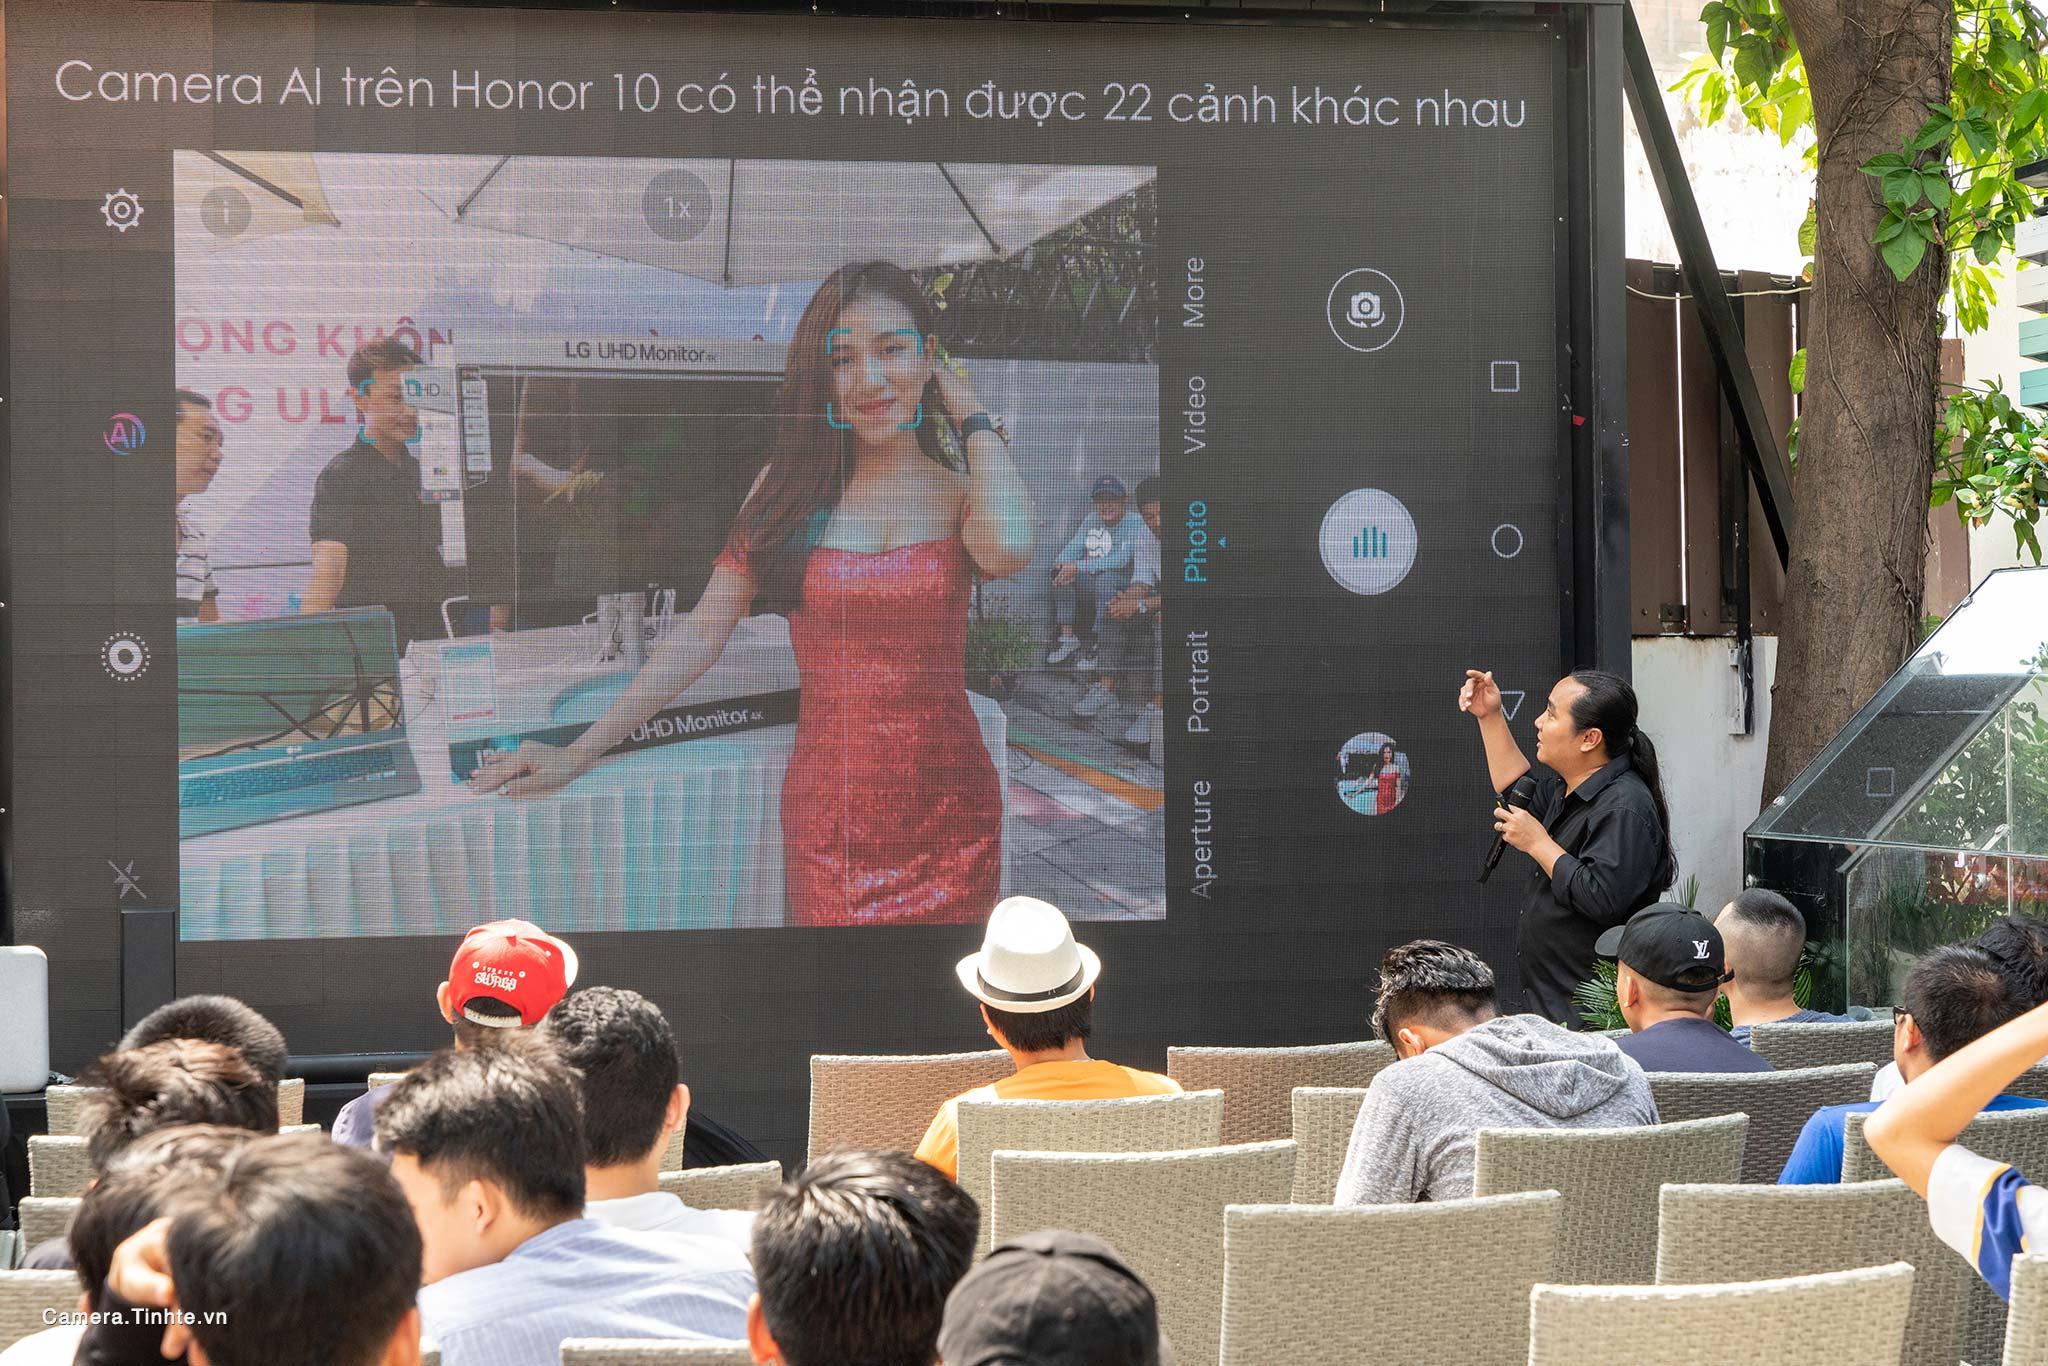 Camera.Tinhte.vn_Offline-trai-nghiem-Honor10_DSC03437.jpg